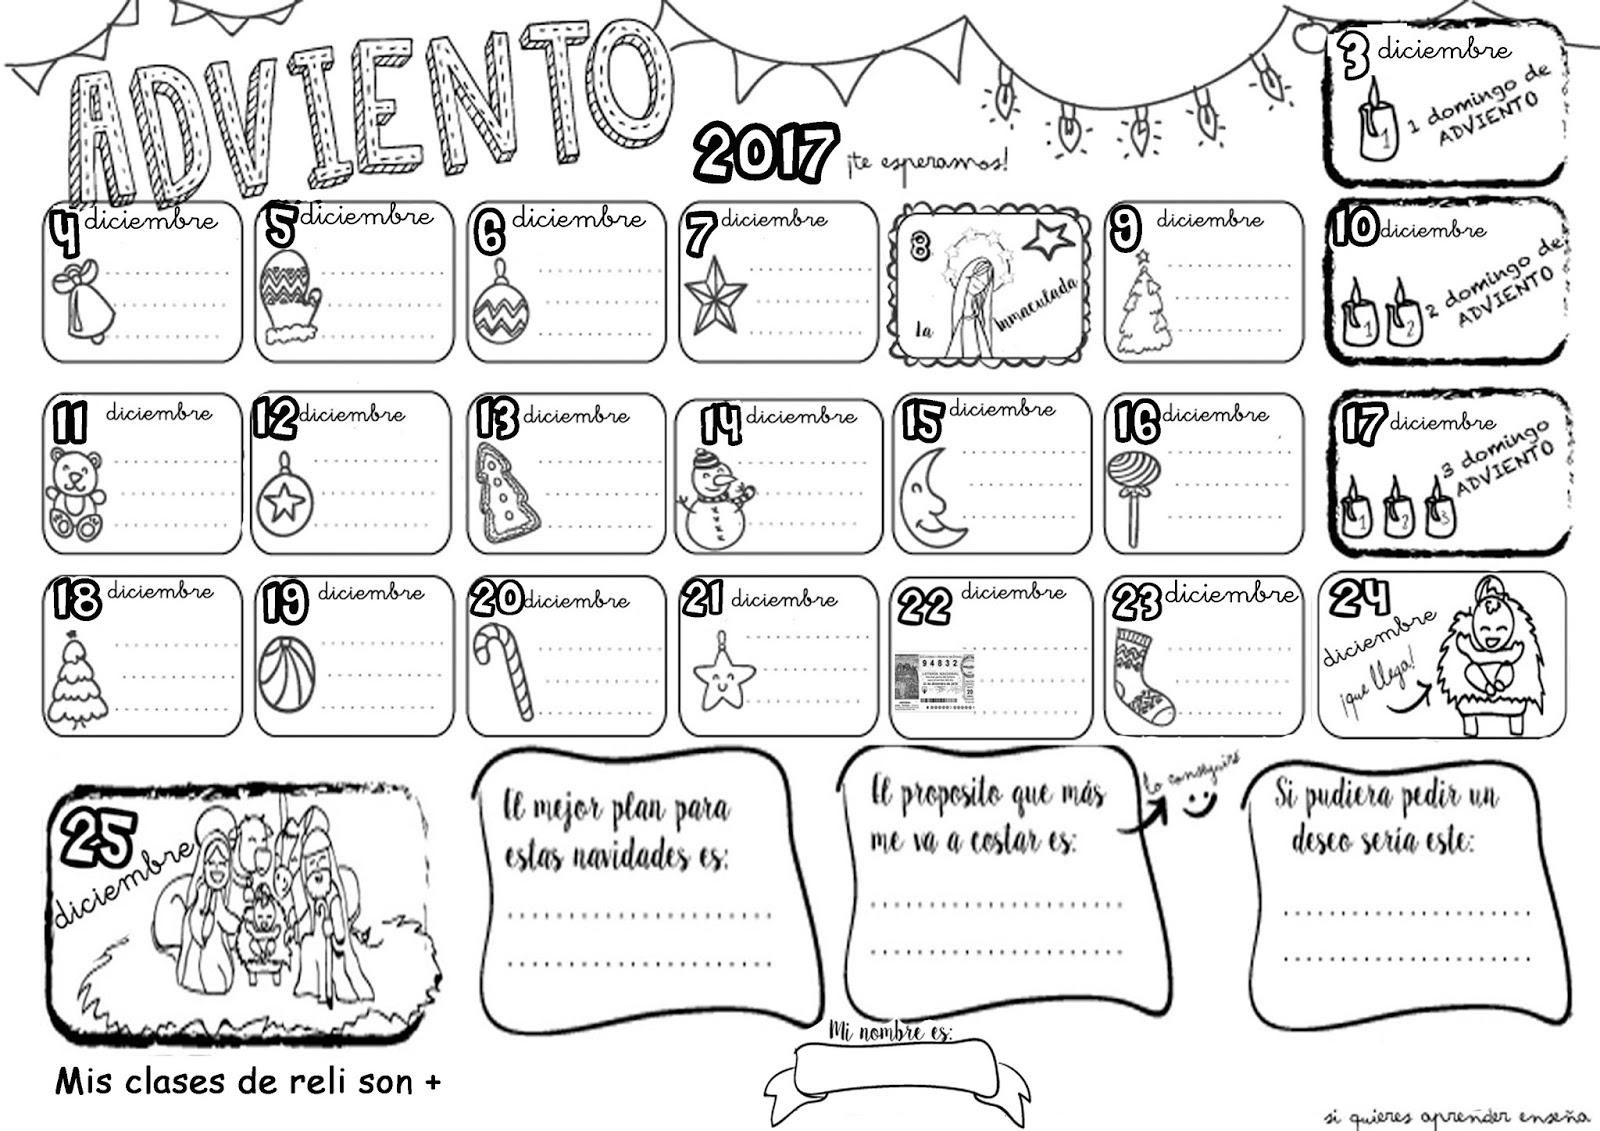 Mis clases de reli son for Calendario adviento 2017